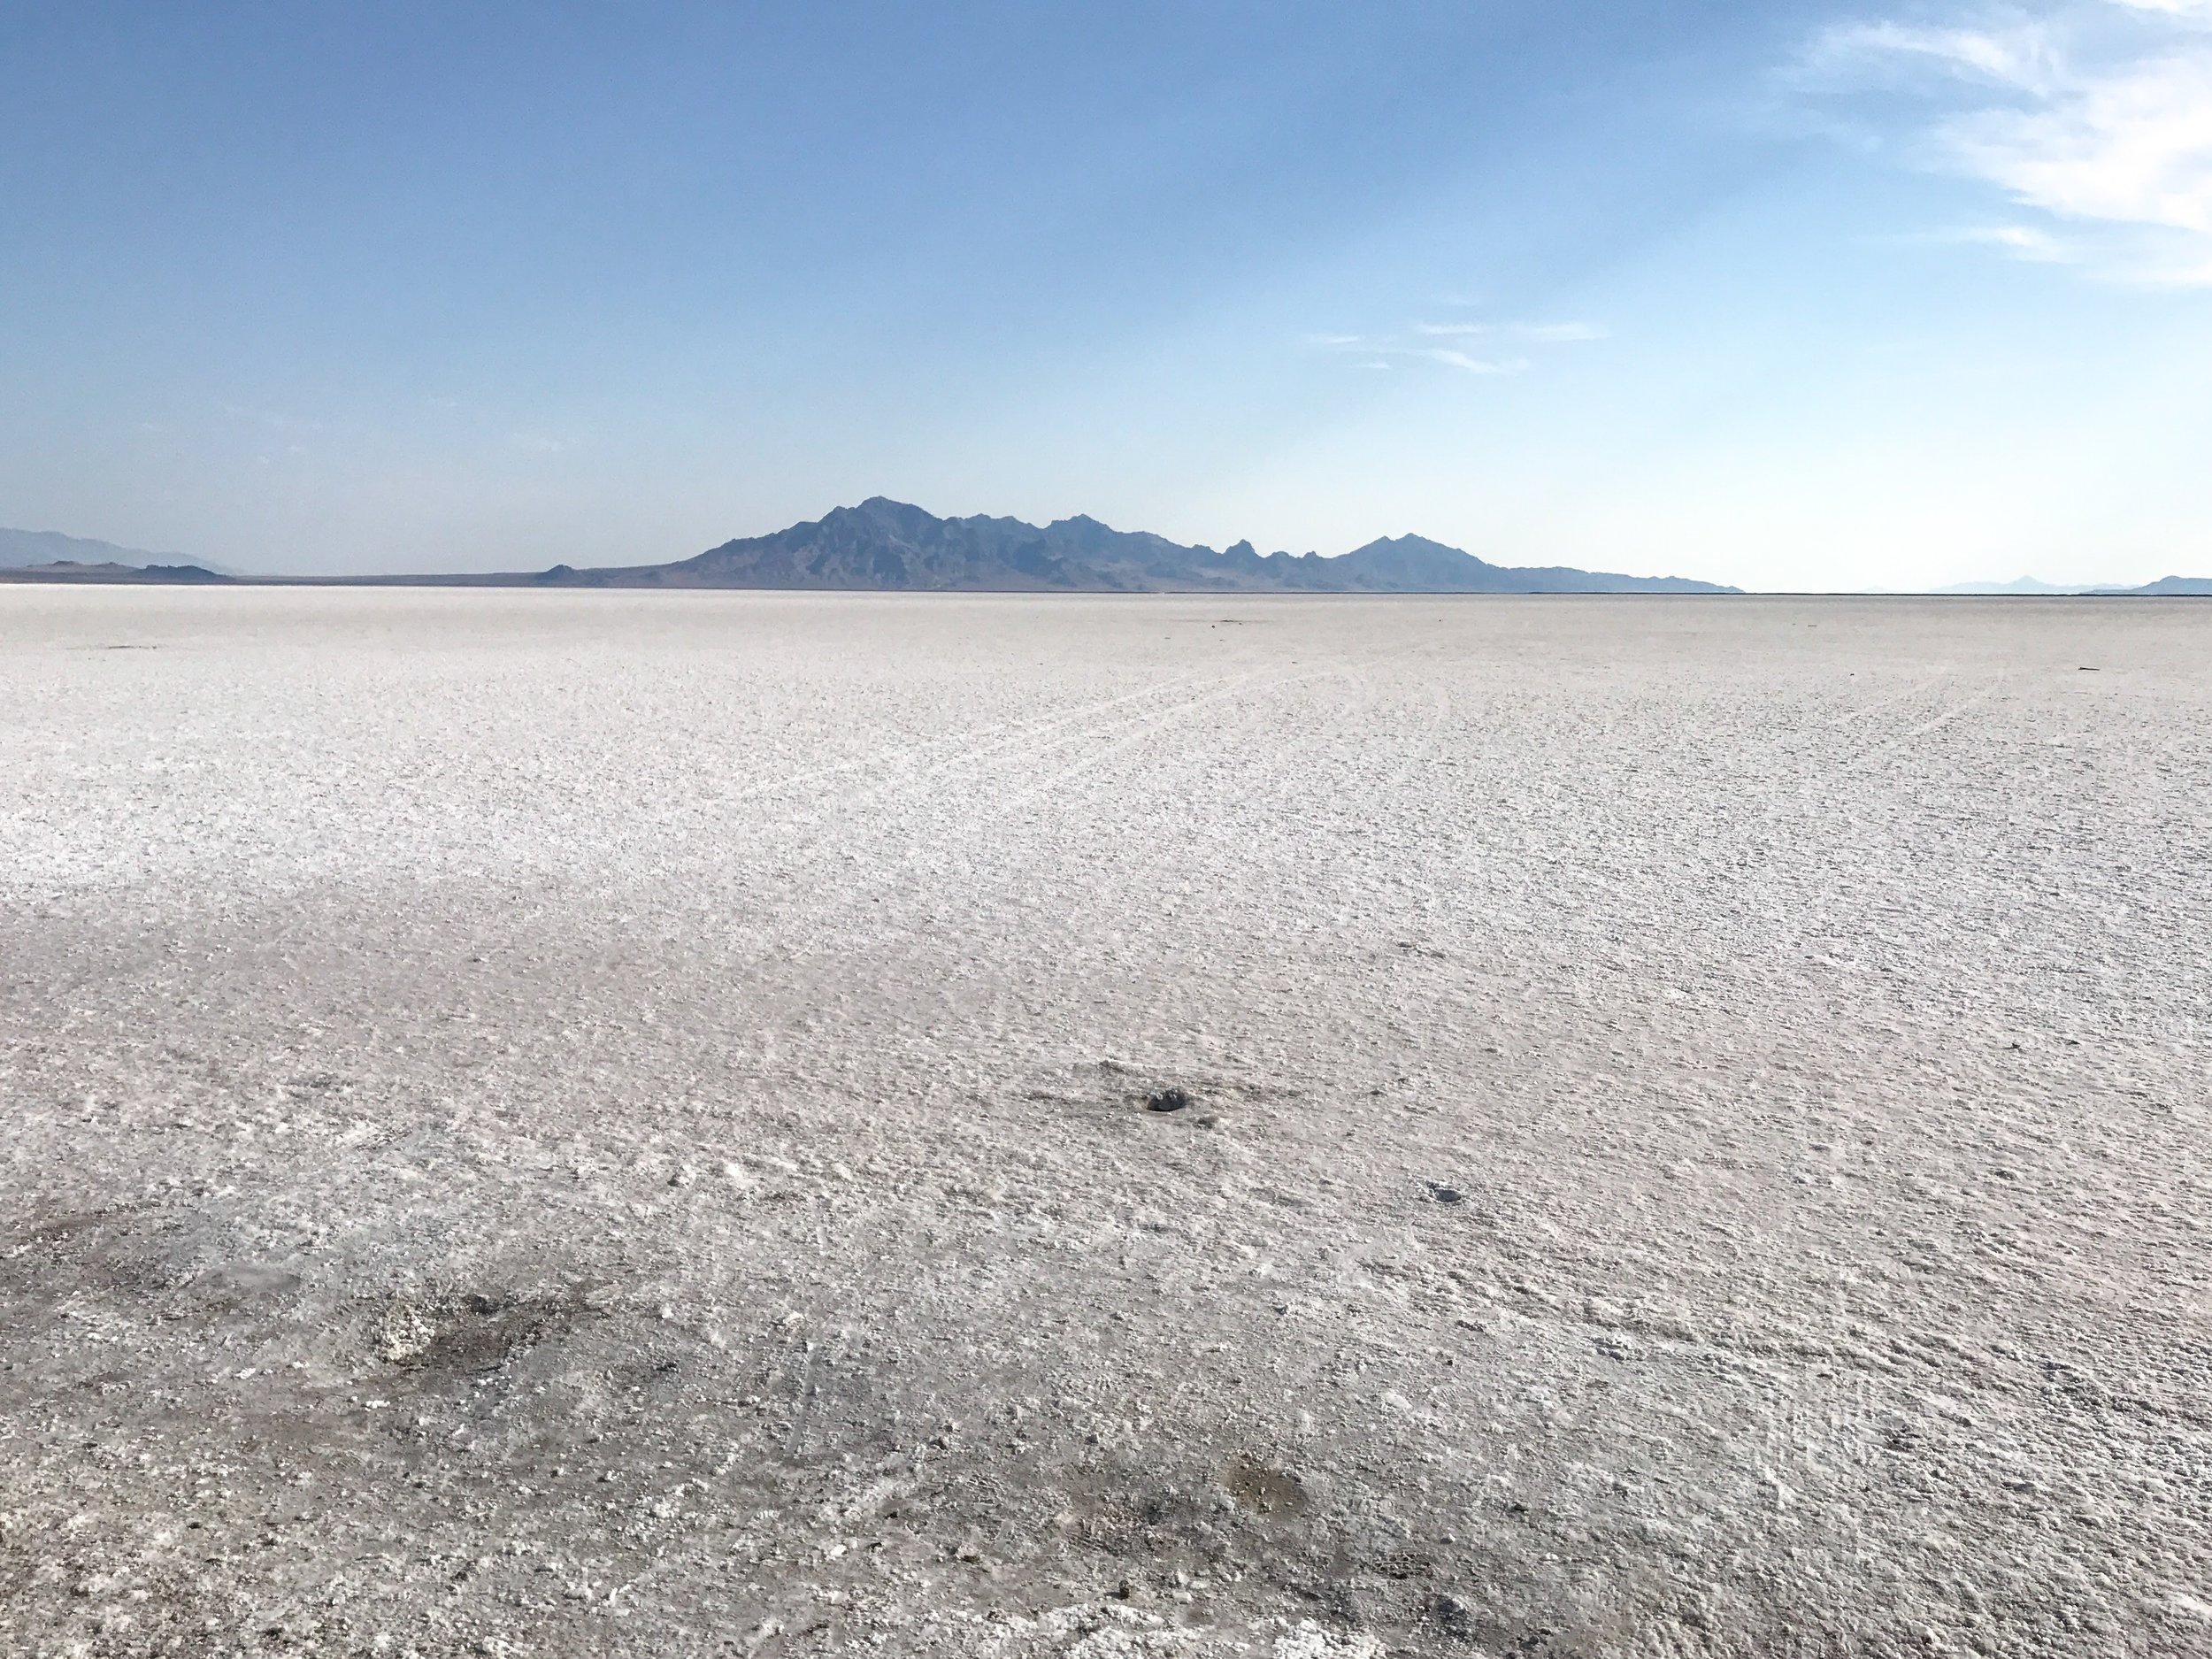 BONNEVILLE SALT FLATS - Famous geological salt flats 90 minutes west of Salt Lake City